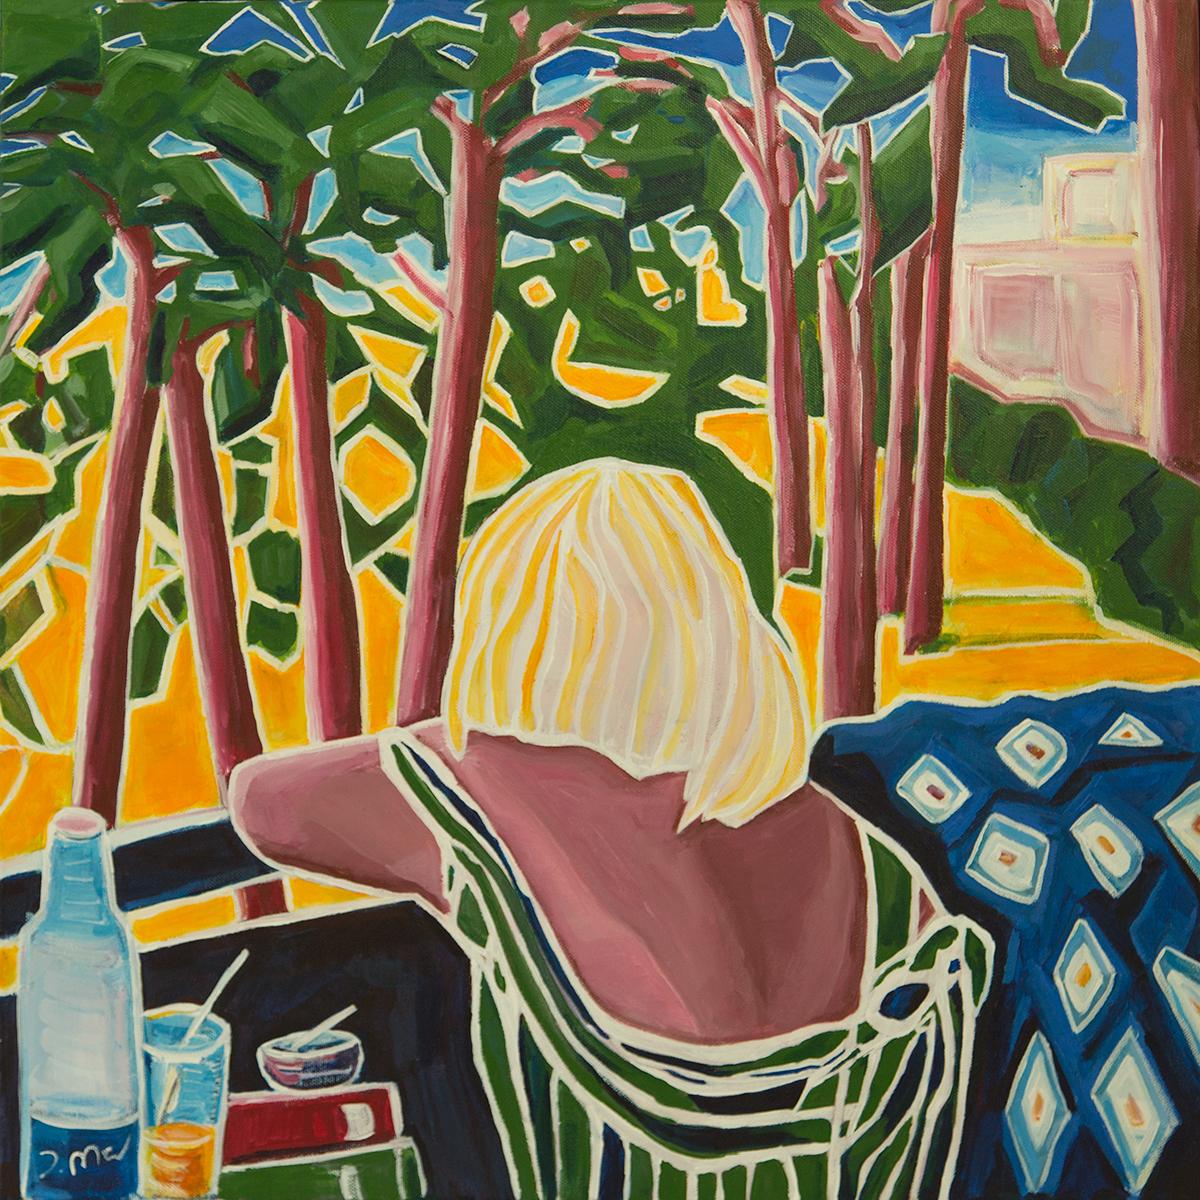 Last days of summer original painting by Judith Marder